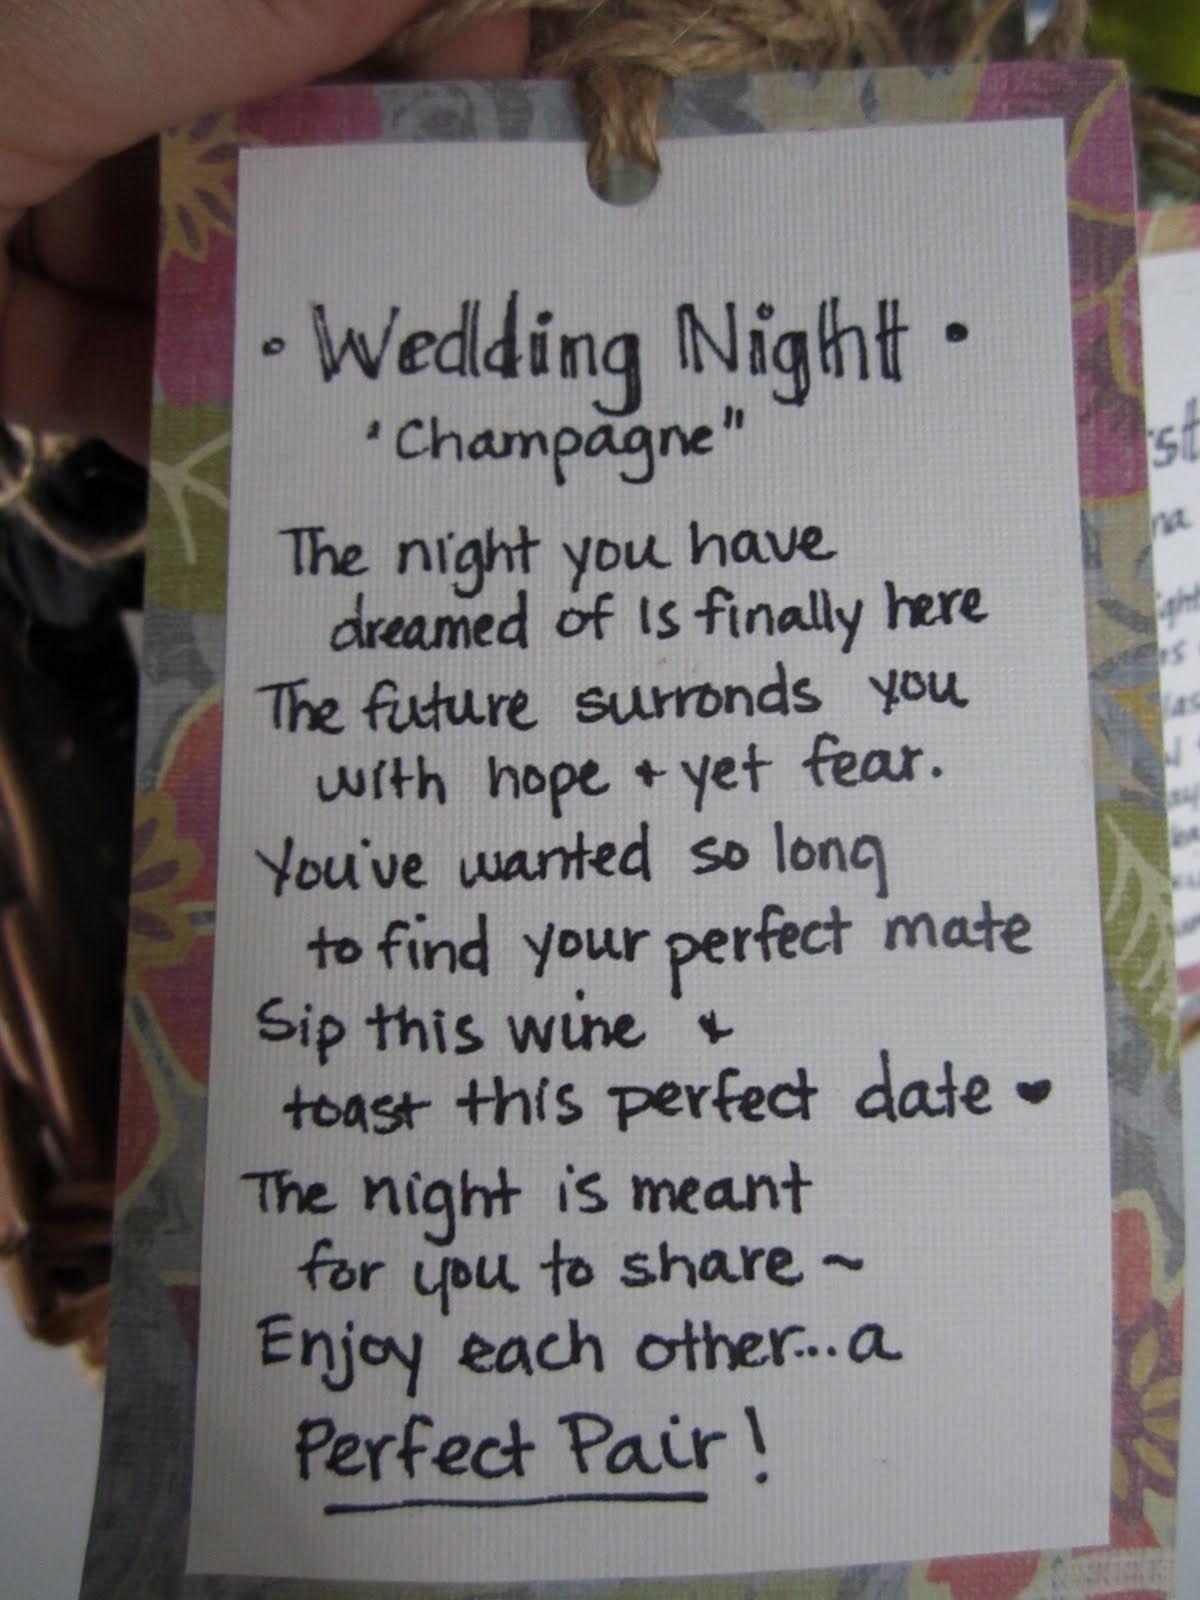 Springsummer052g 12001600 Pixels Korey Wedding Pinterest